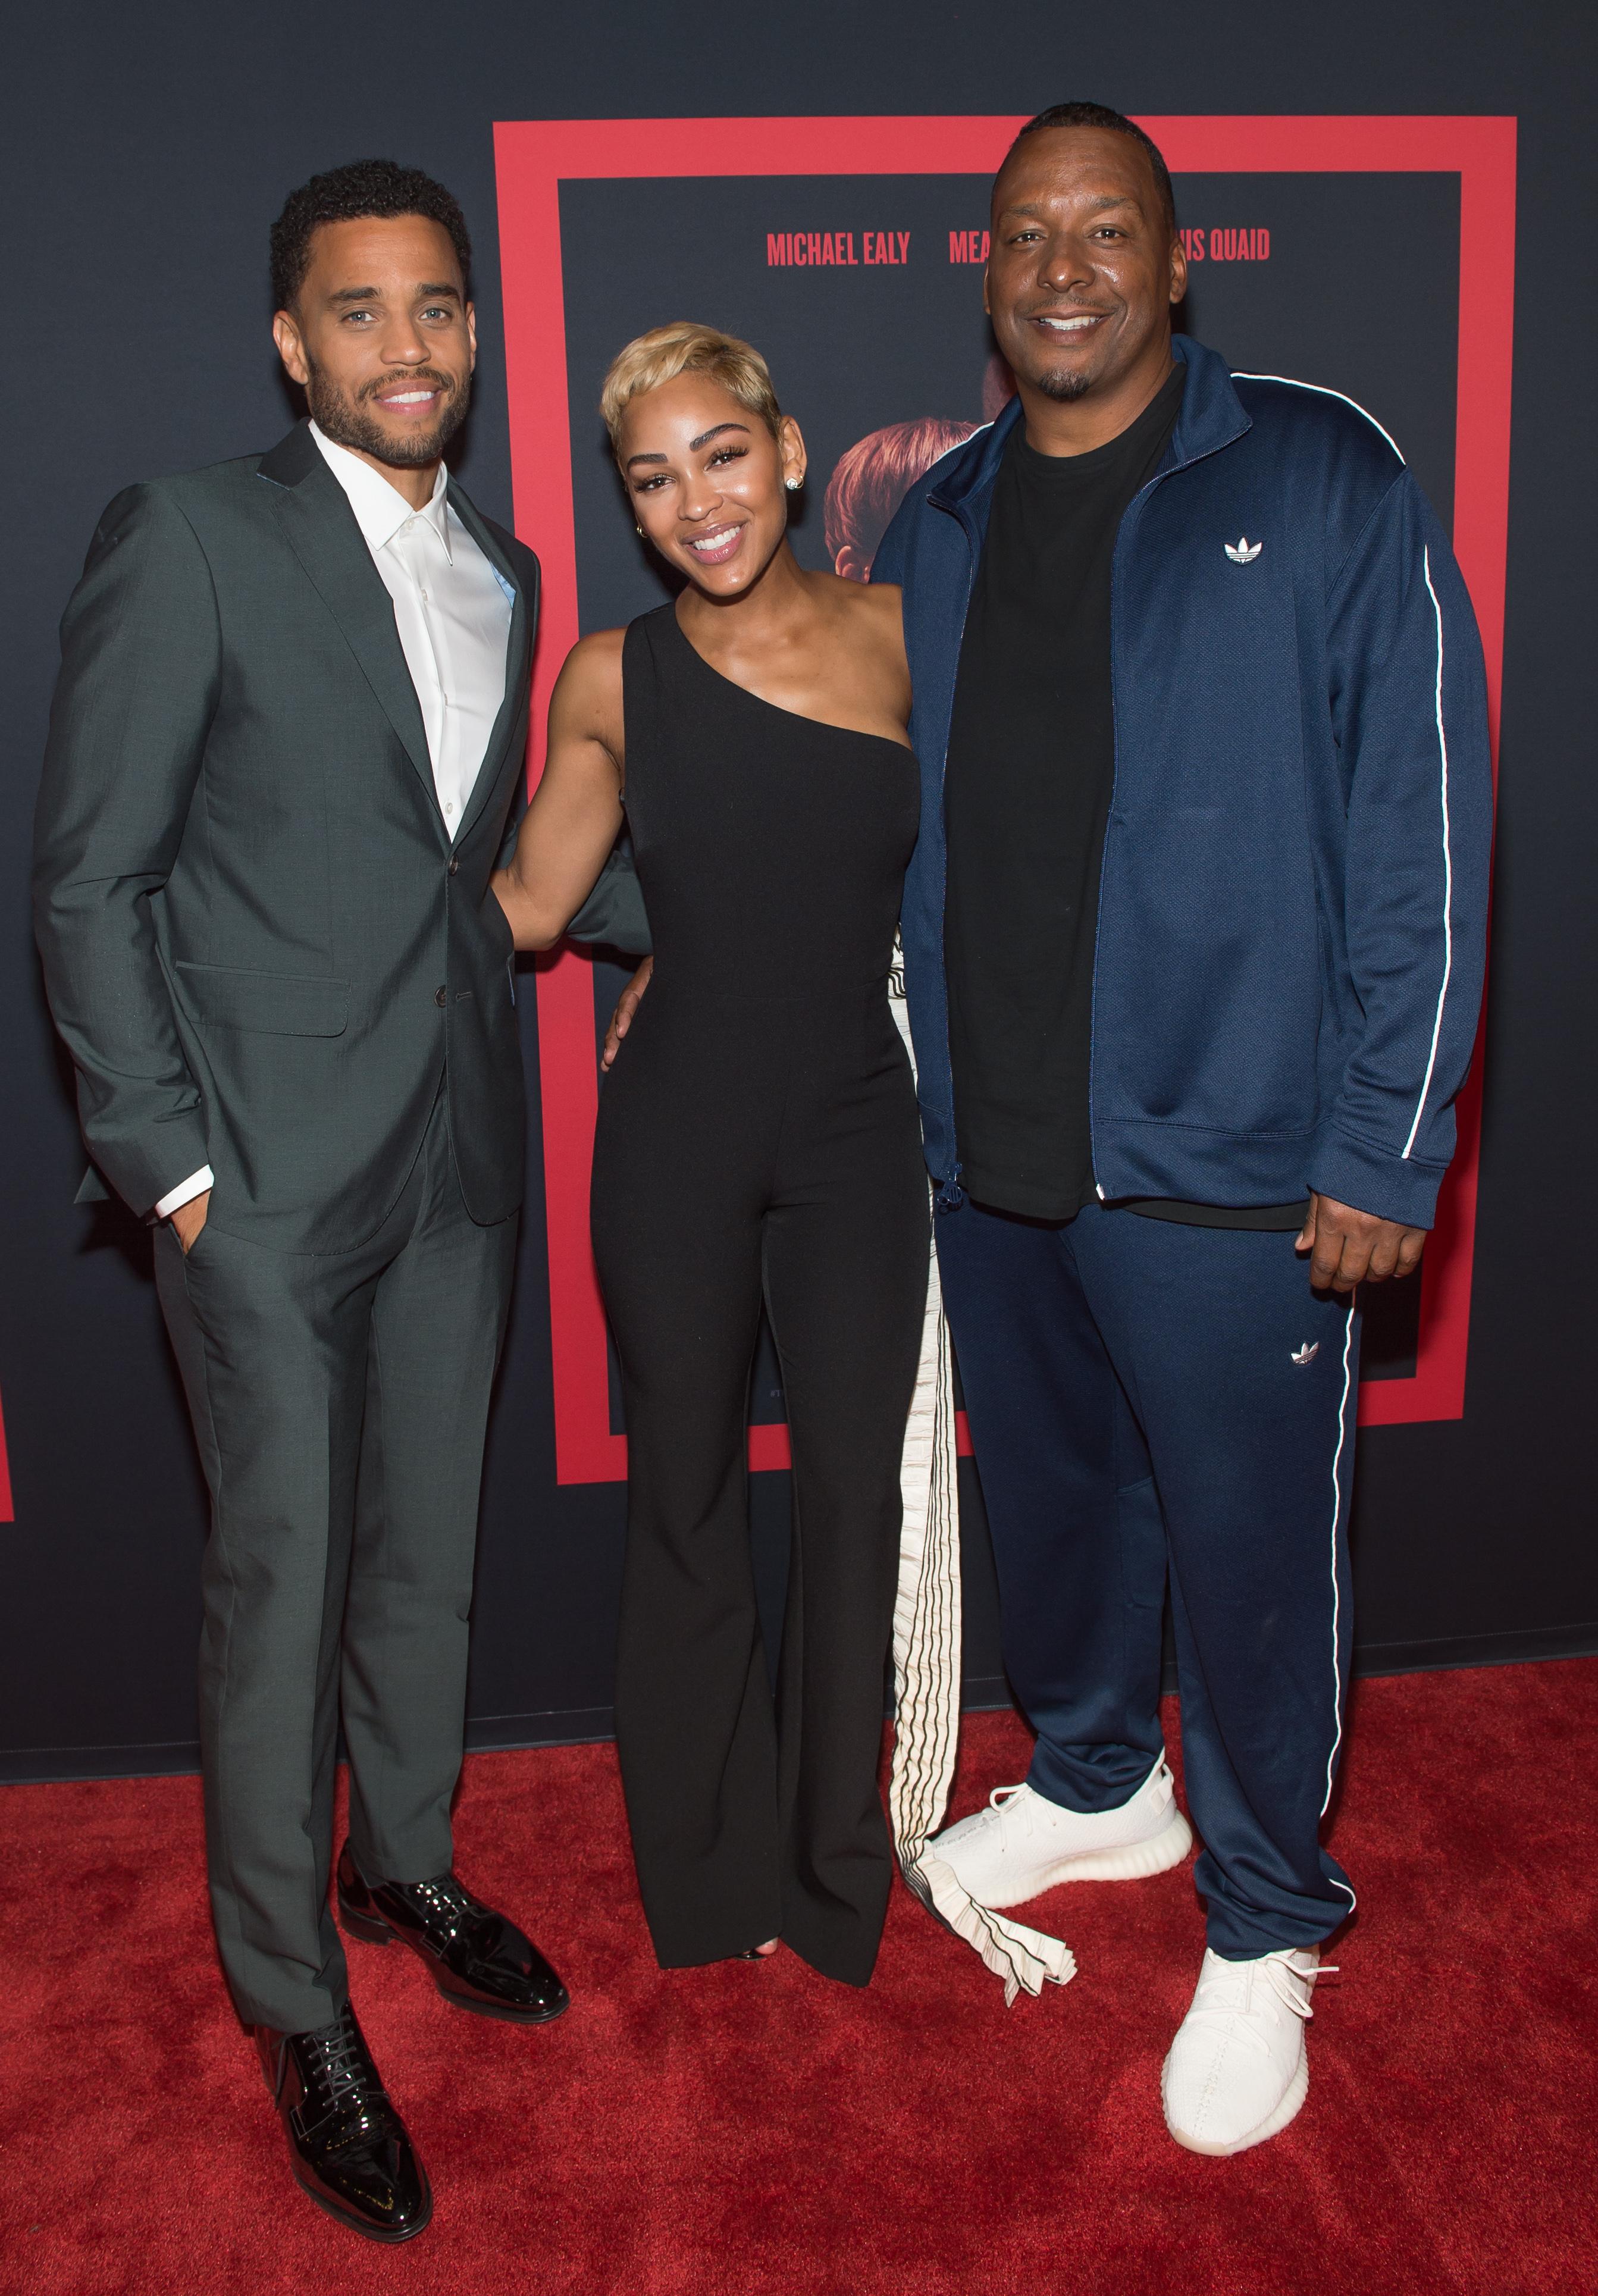 THE INTRUDER Invades Atlanta With Actors Michael Ealy, Meagan Good & Deon Taylor